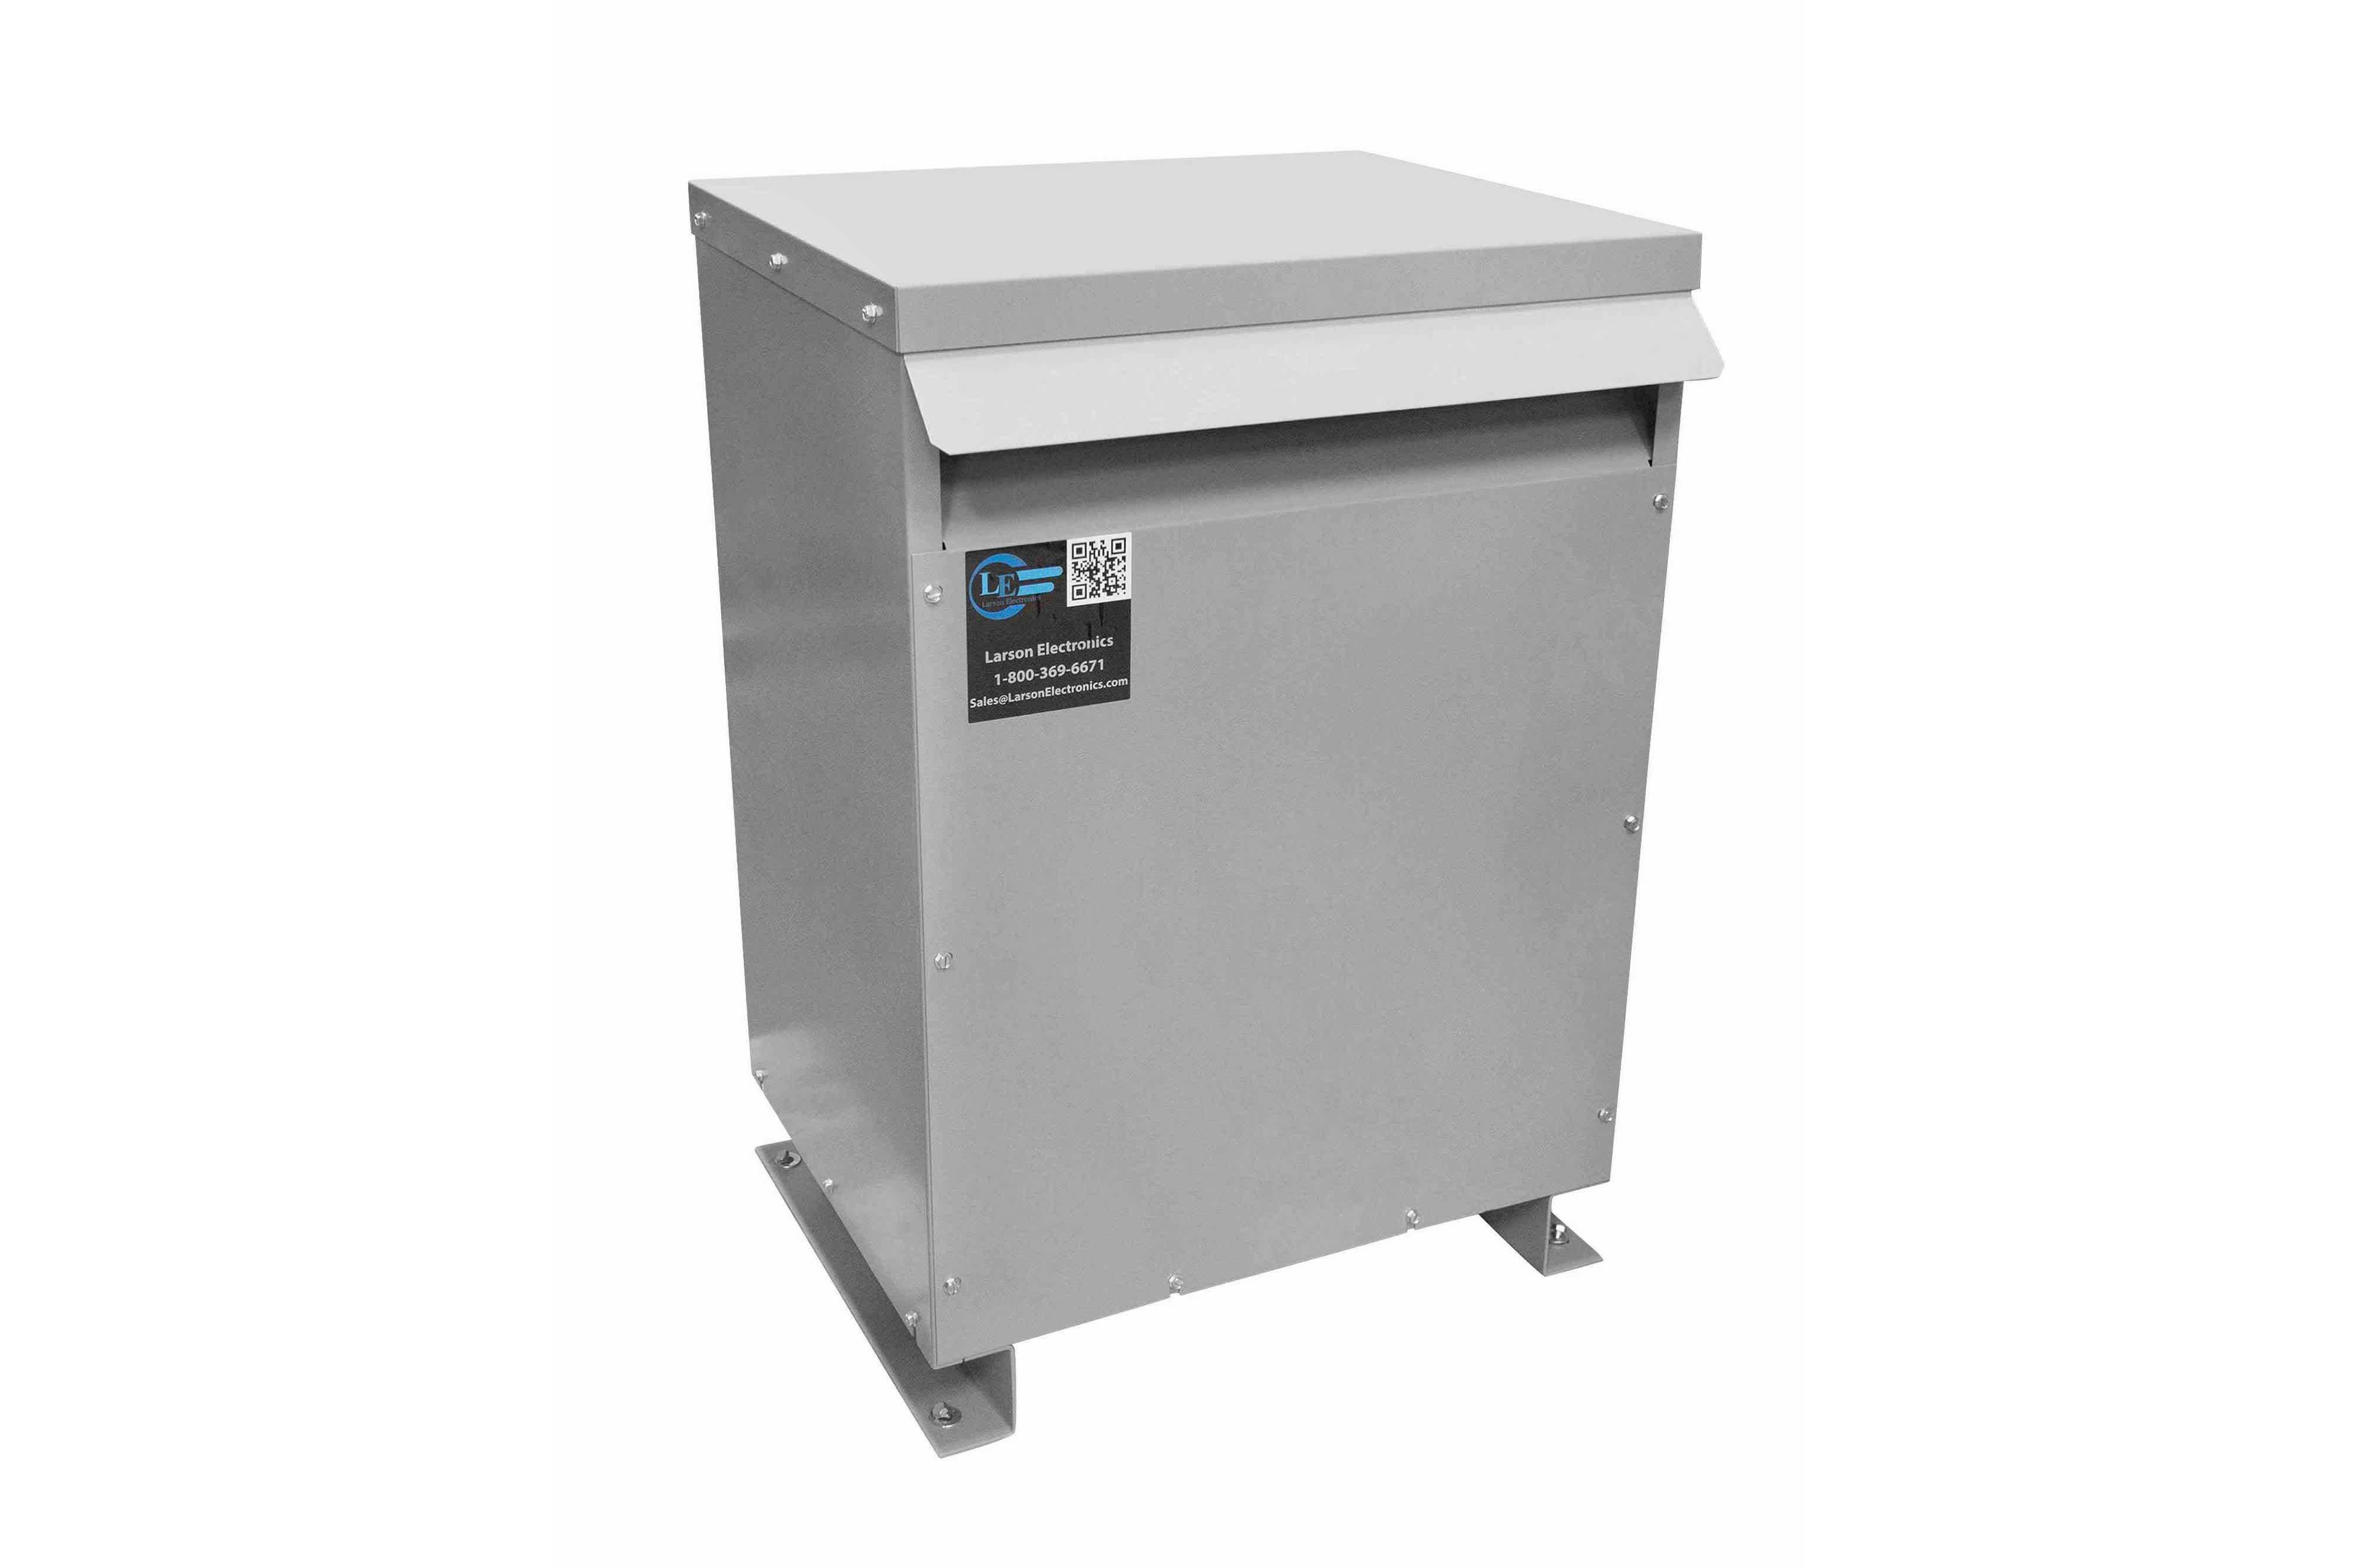 45 kVA 3PH Isolation Transformer, 460V Wye Primary, 380Y/220 Wye-N Secondary, N3R, Ventilated, 60 Hz